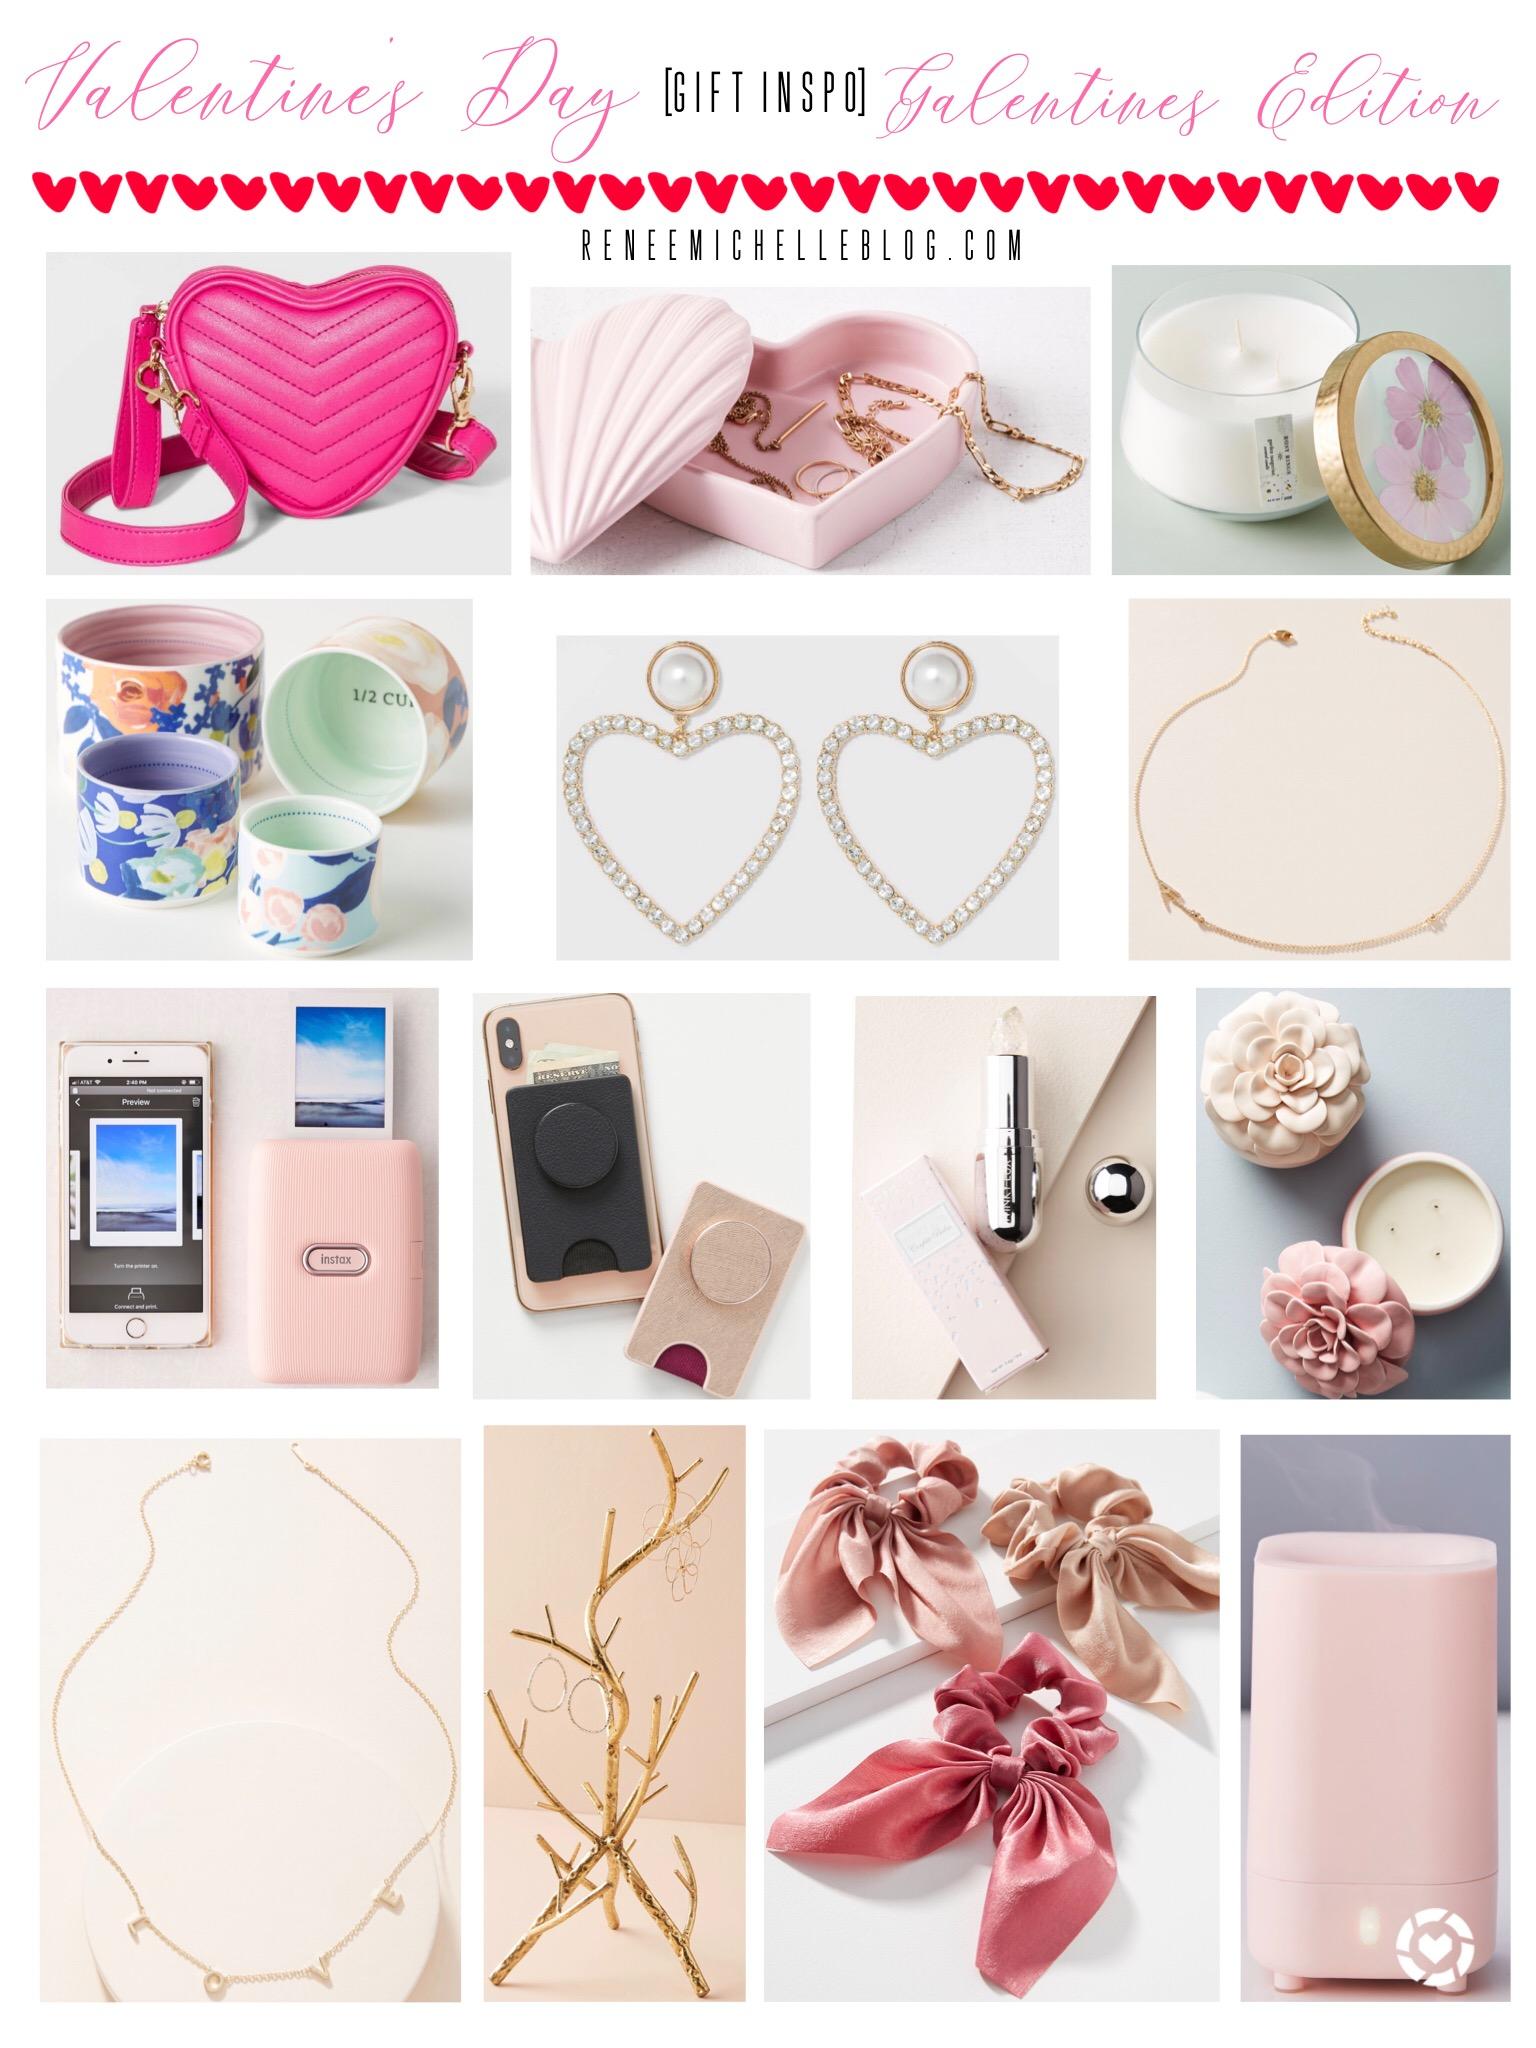 Valentine's Day Gift Inspo : Galentine's Edition